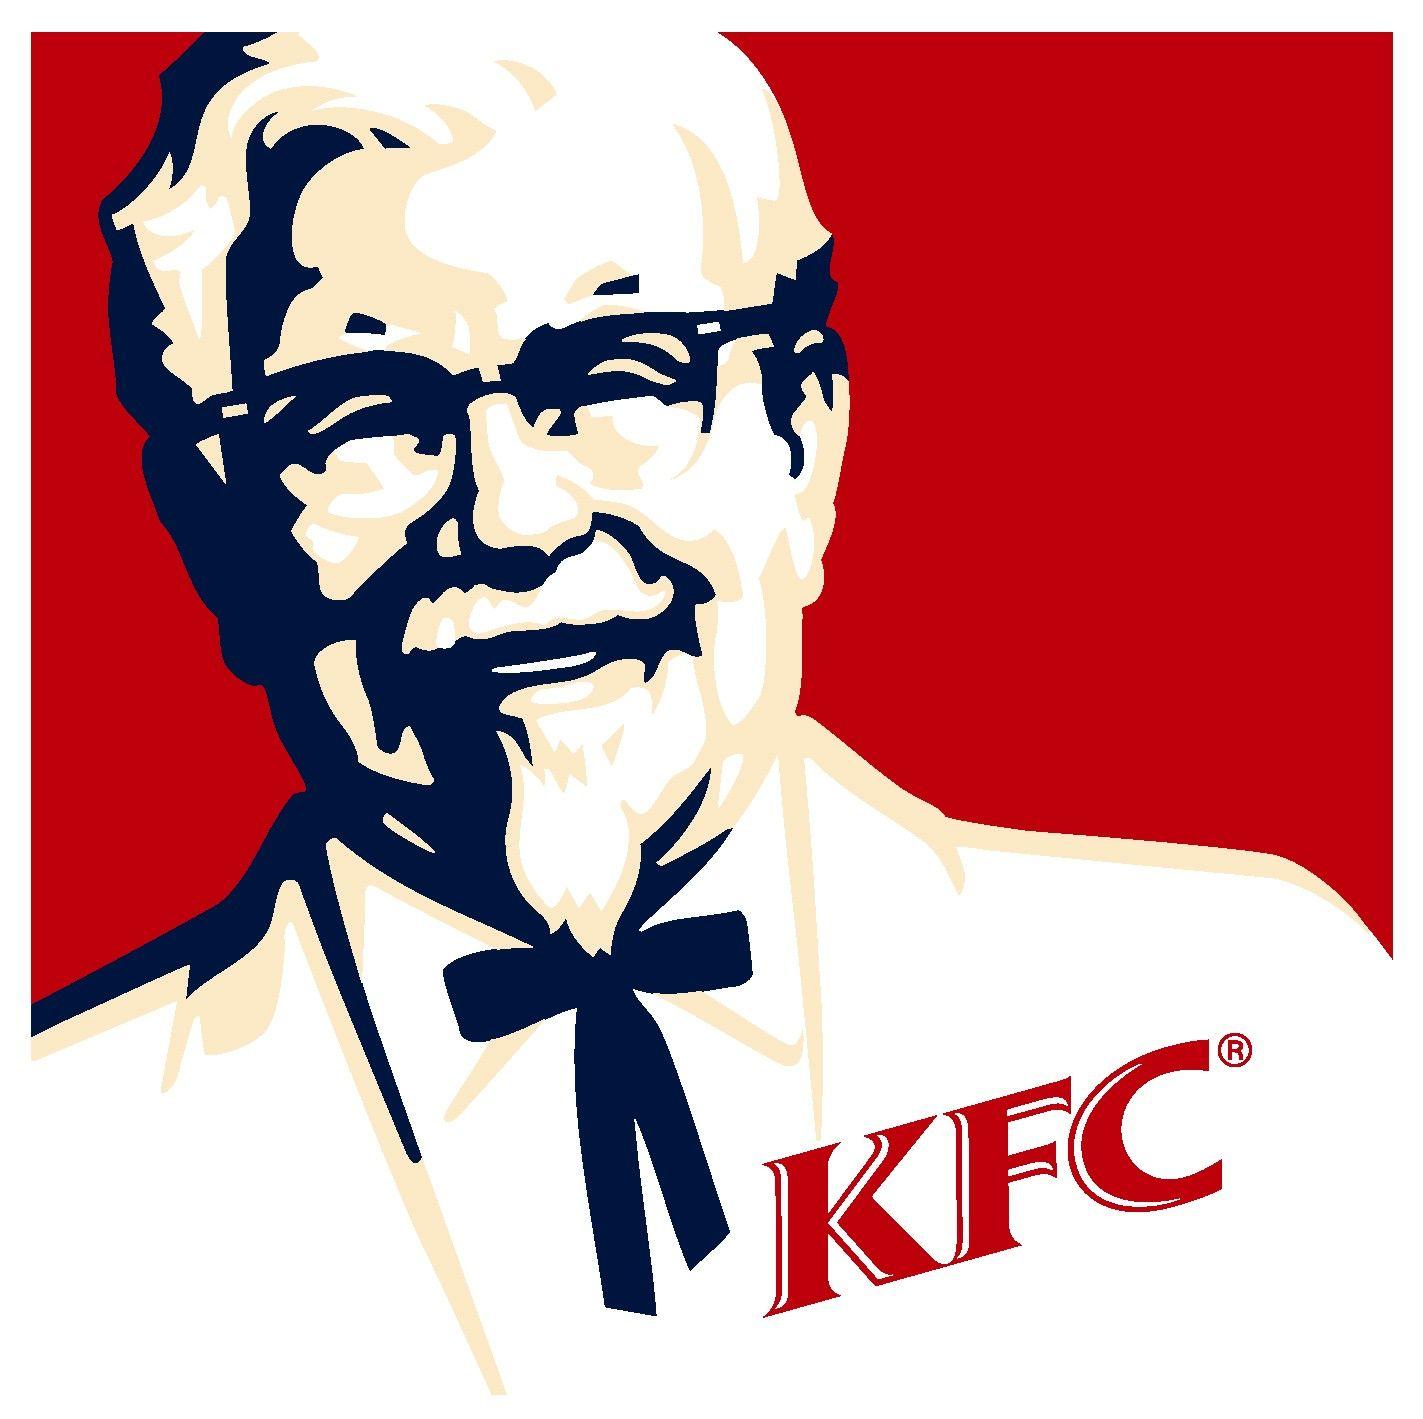 This guys cool, he made KFC! Kfc, South beach diet